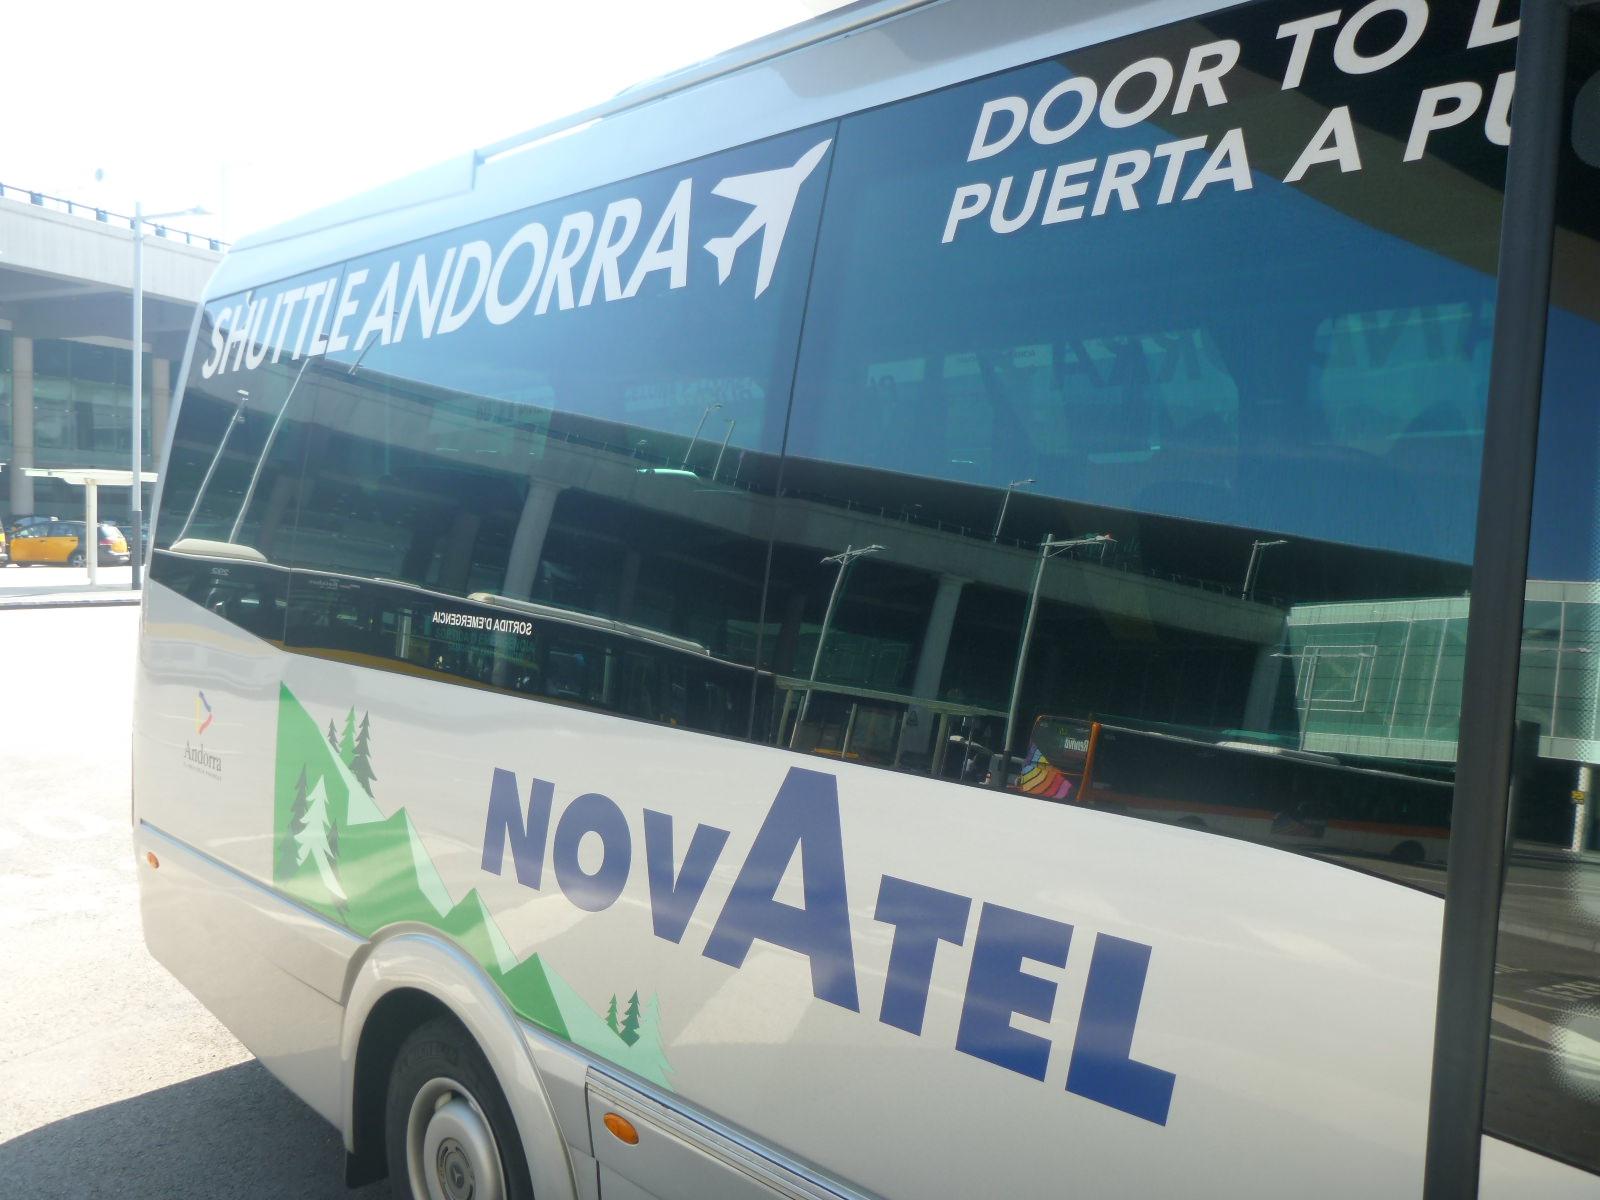 Фото автобуса компании Novatel